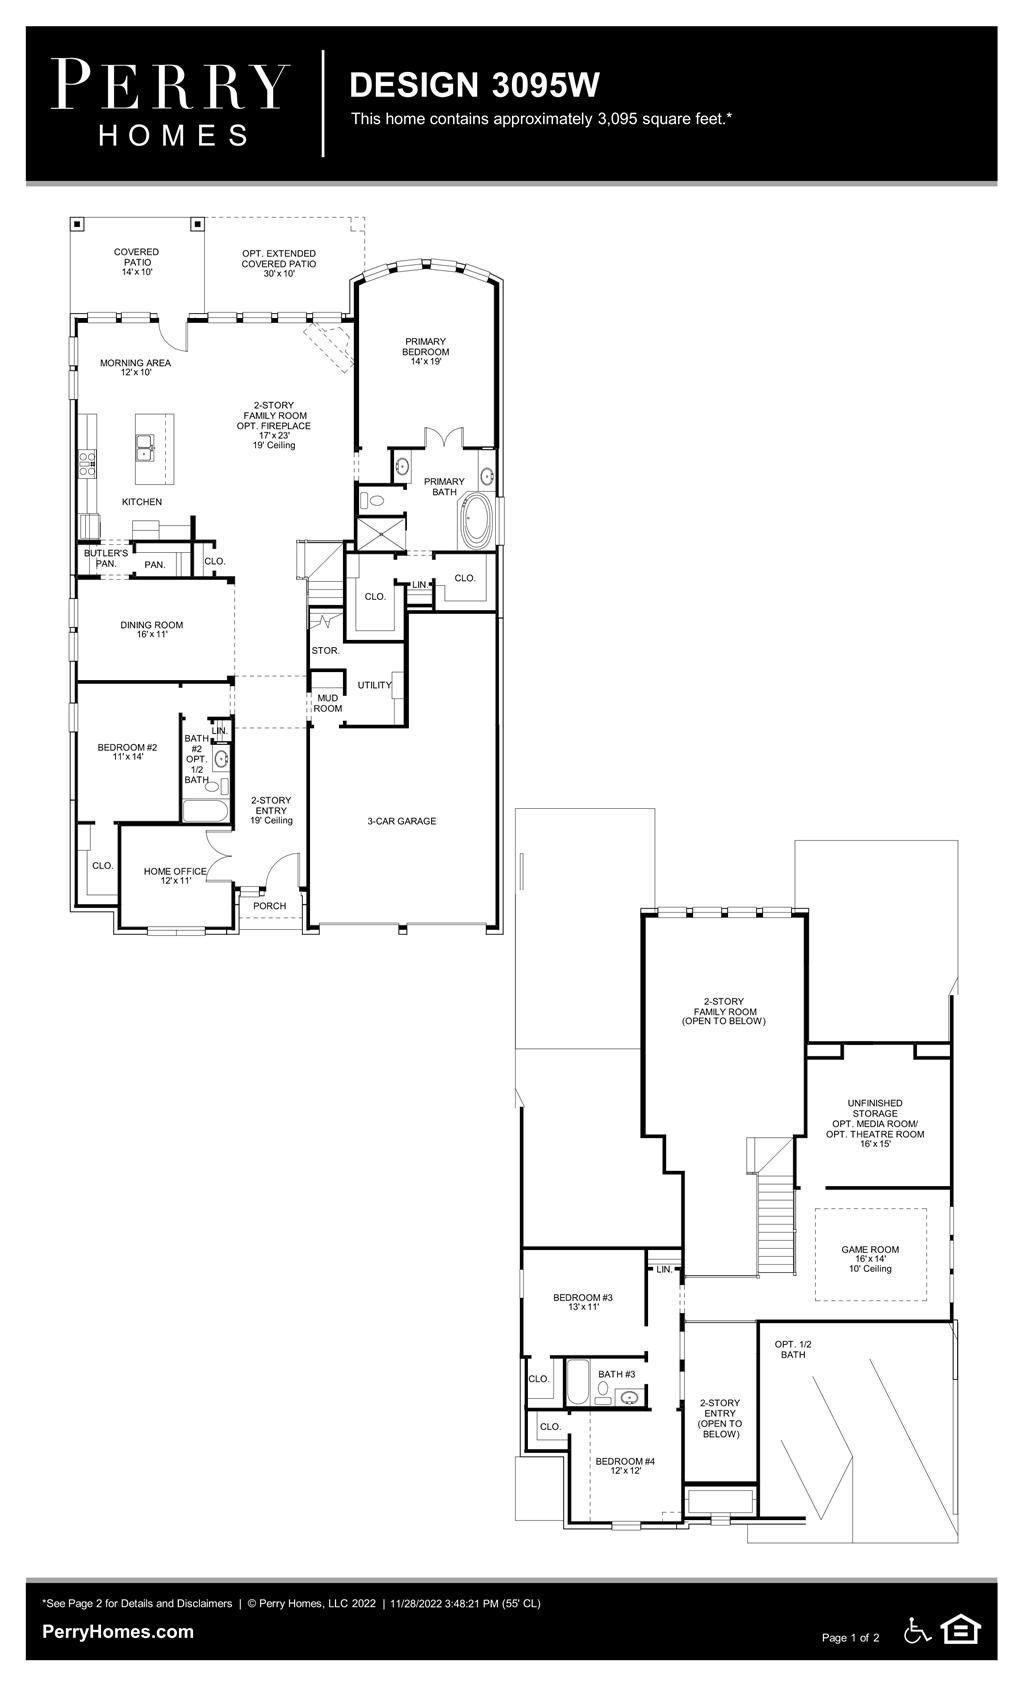 Floor Plan for 3095W